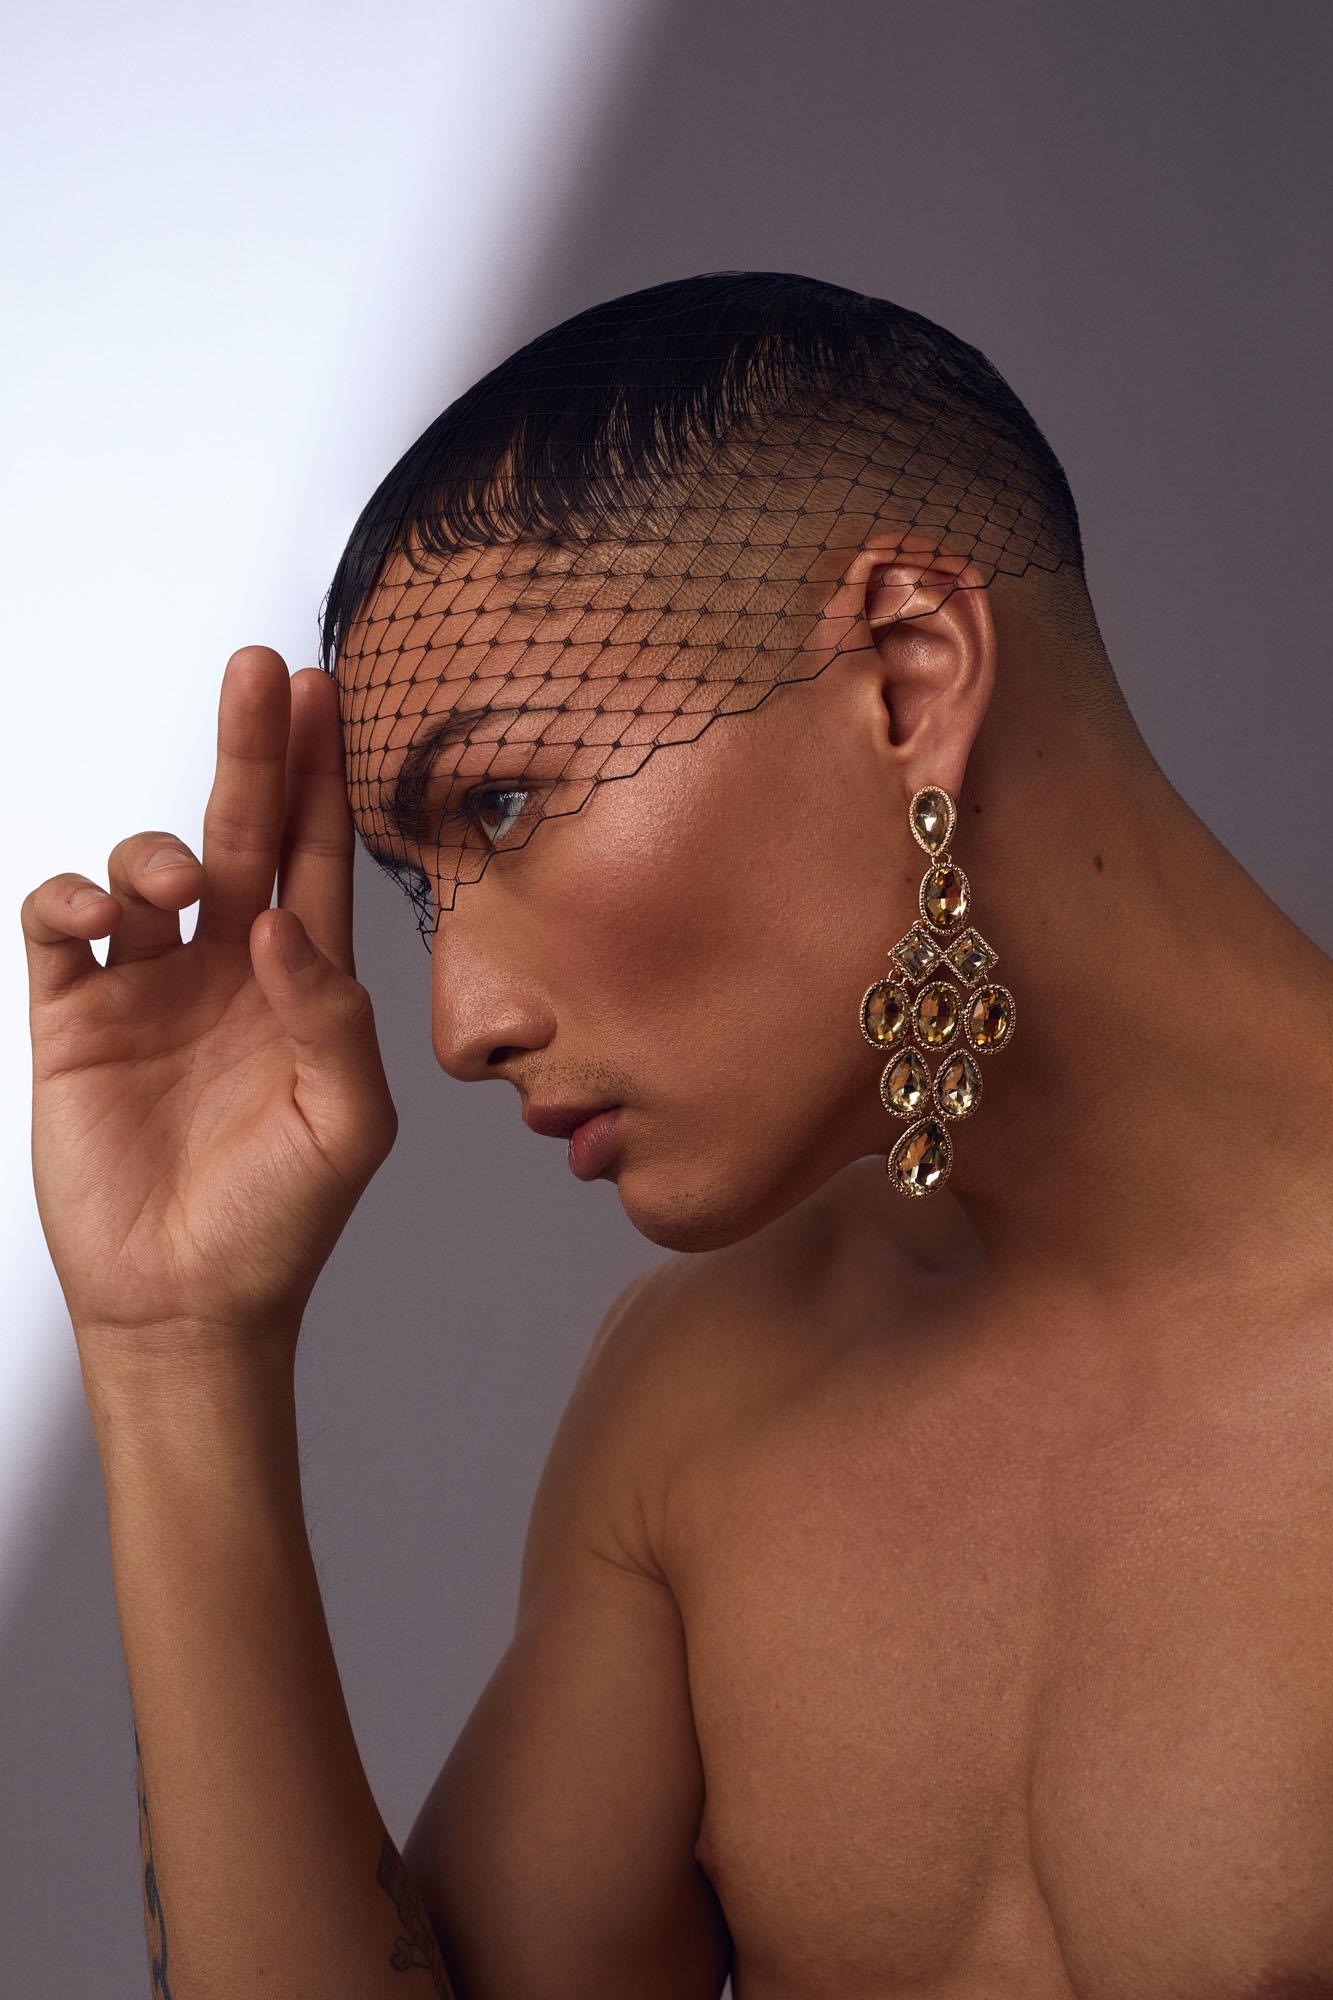 Maquillage-beaute-feminin-sur-mannequin-homme